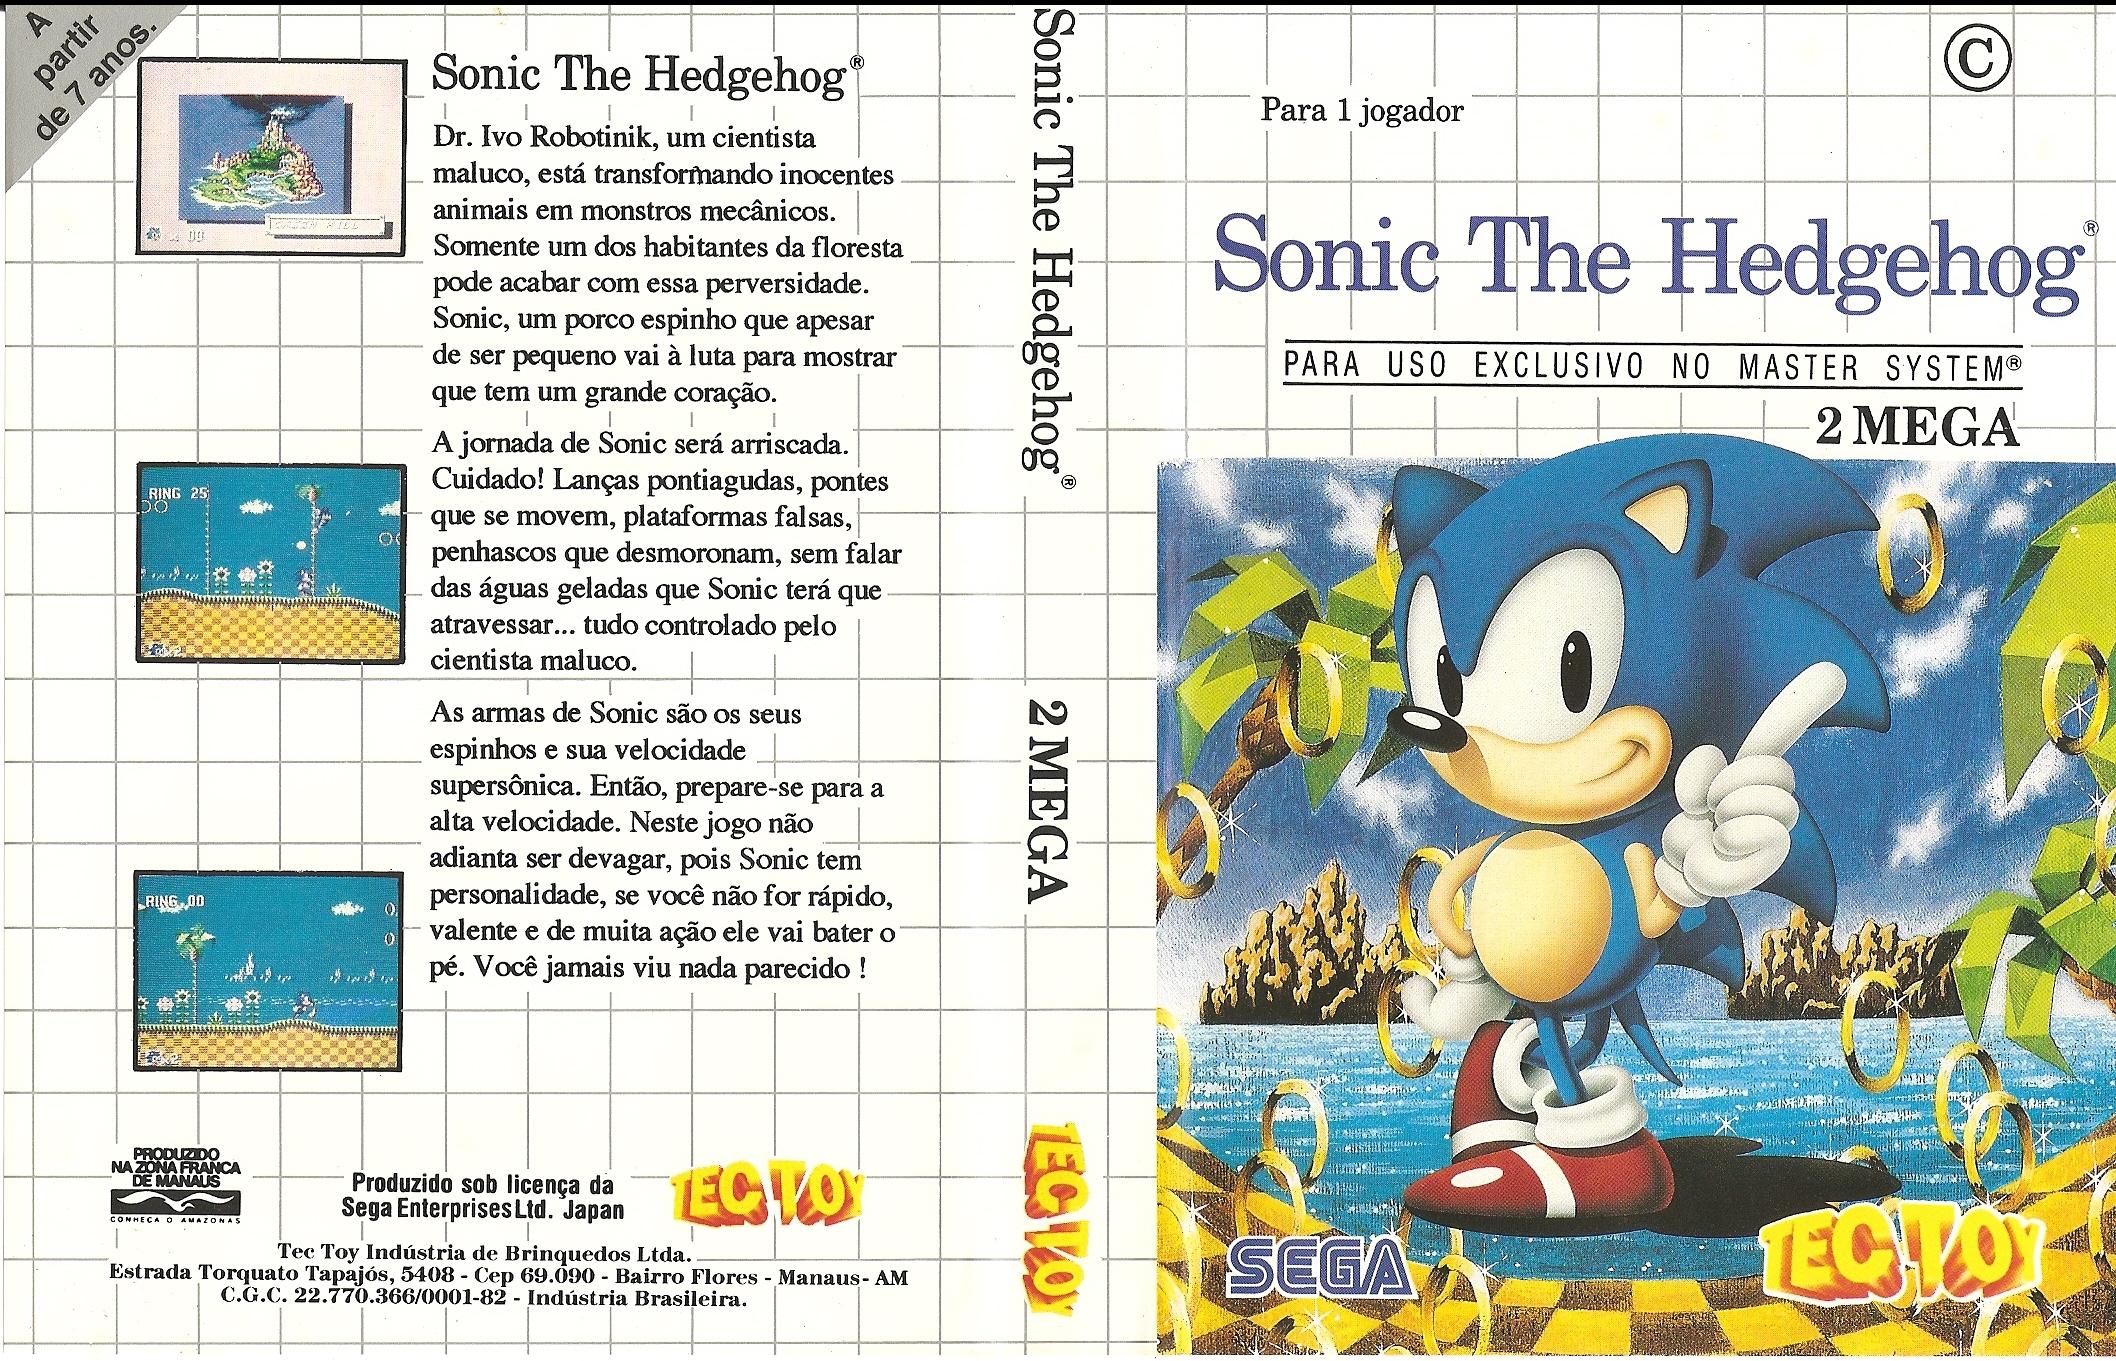 Sonic The Hedgehog Sega Master System Tec Toy Tips Skooter Blog